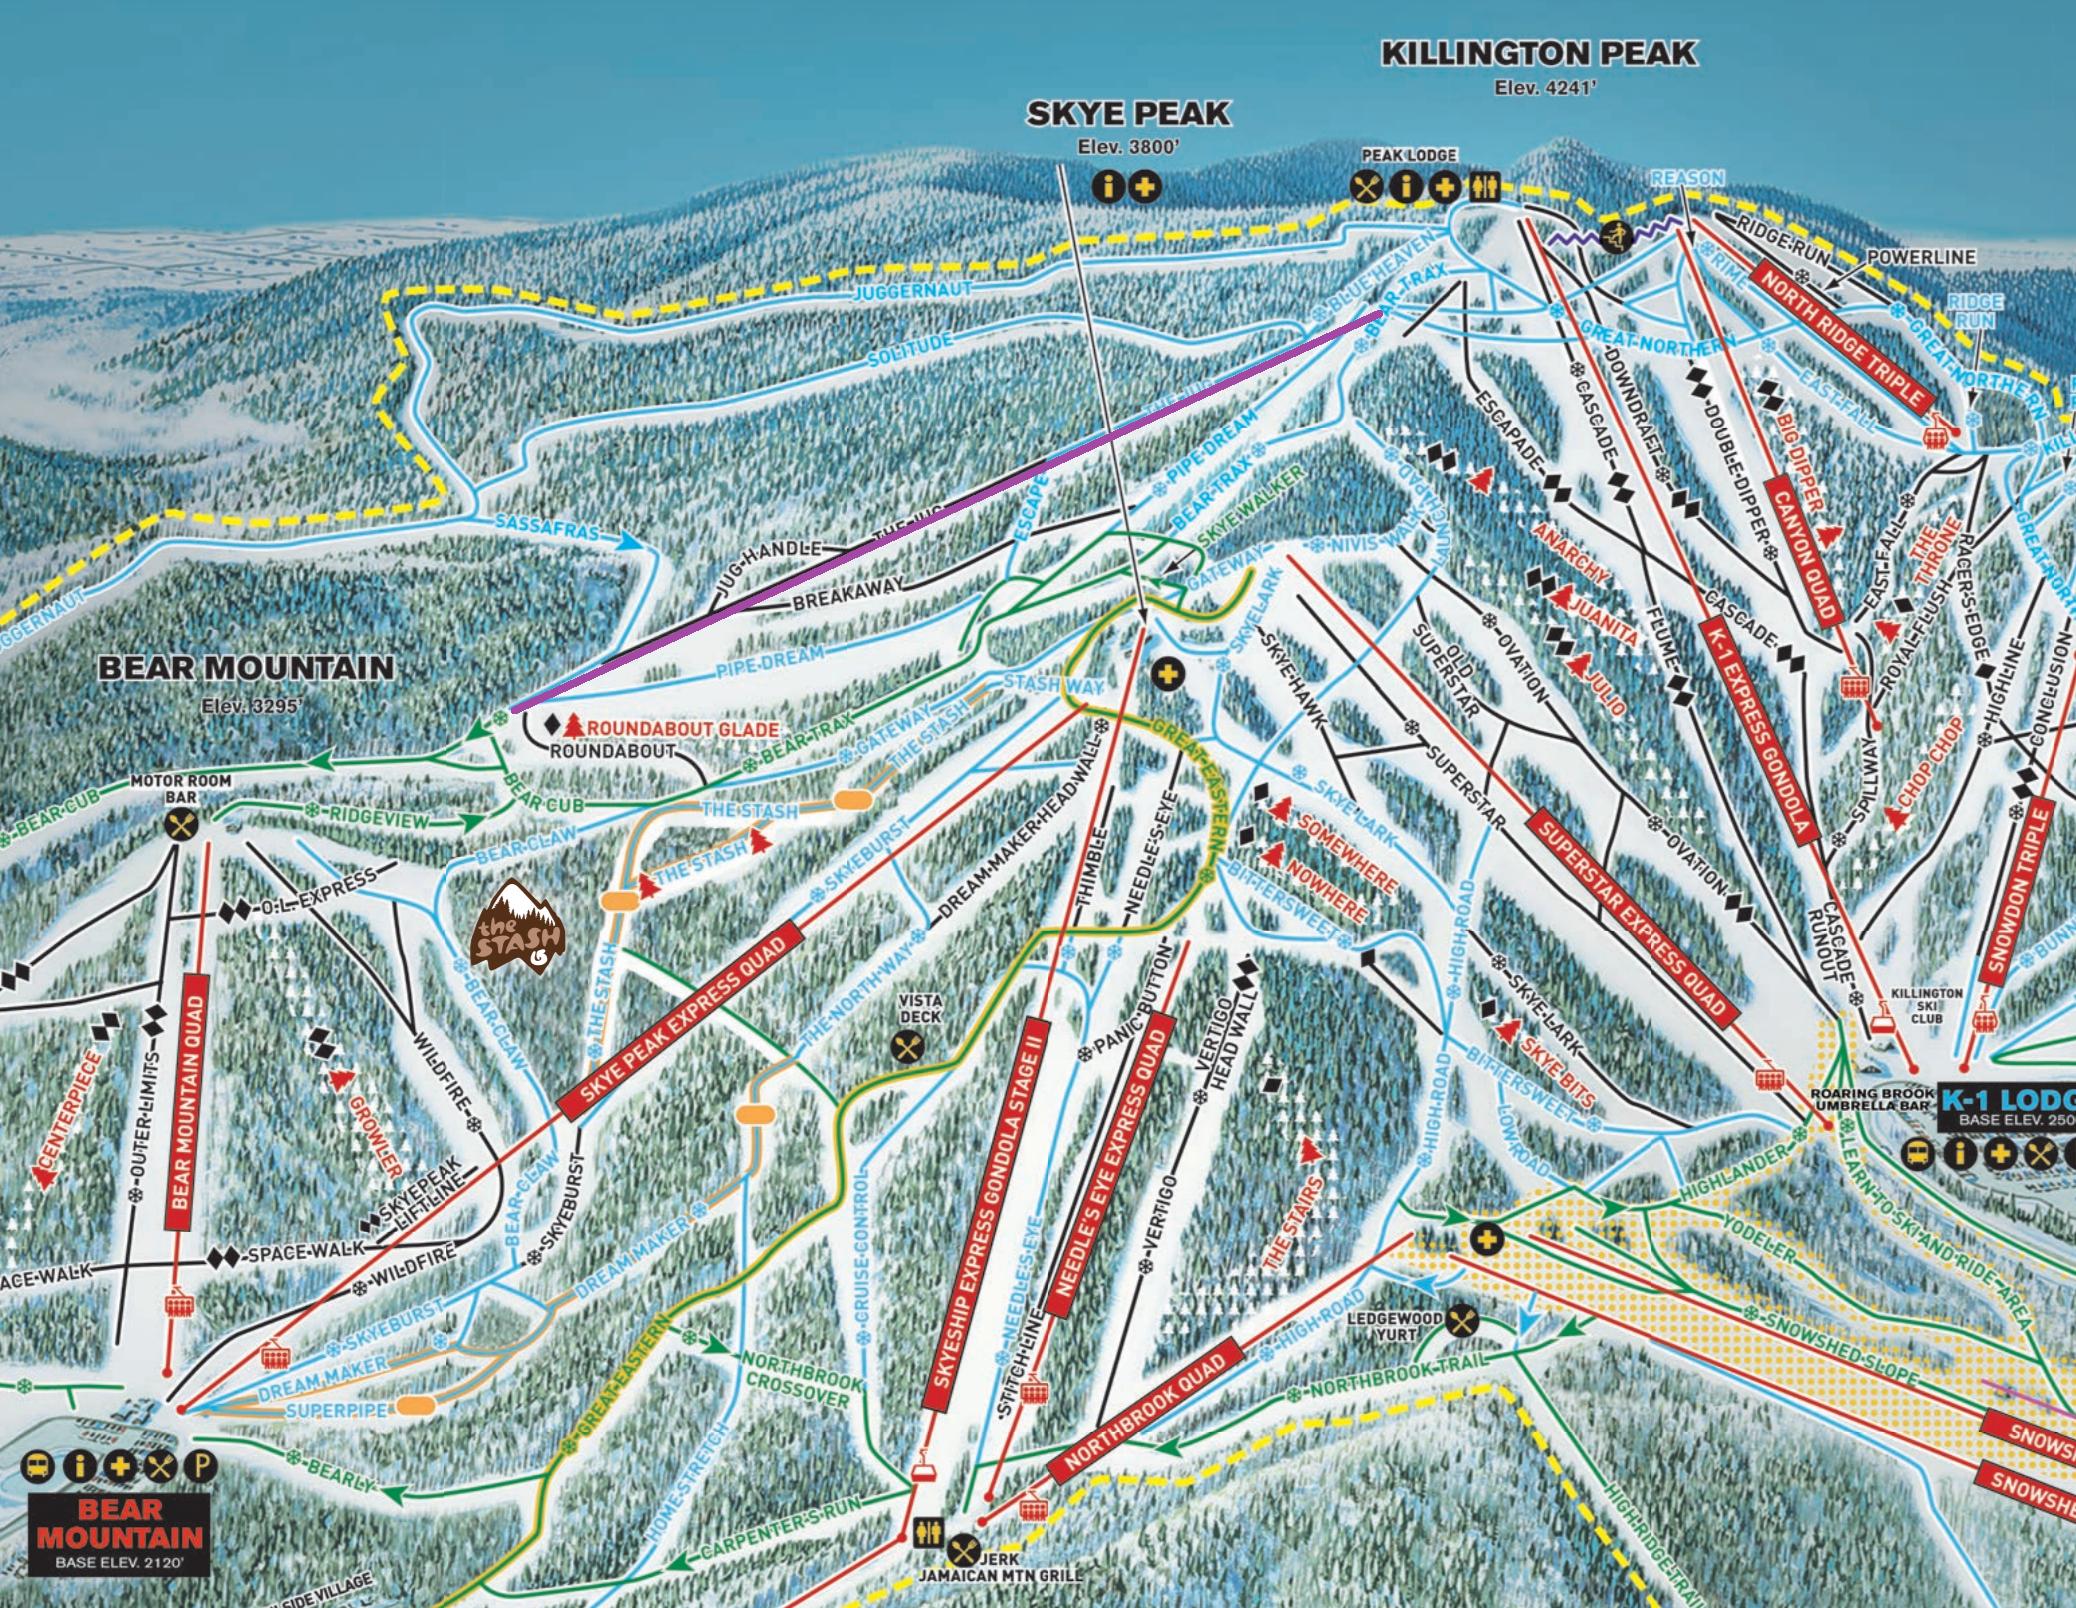 Killington Adding South Ridge Quad in 2018 – Lift Blog on stowe ski map, lutsen mountains ski map, north carolina ski map, marmot basin ski map, breckenridge ski map, cannon mountain ski map, okemo ski map, pico ski map, wild mountain ski map, connecticut ski map, mount snow ski map, mount kato ski map, bradford ski map, shawnee peak ski map, bretton woods ski map, greek peak ski map, diamond peak ski map, snowshoe mountain ski map, 49 degrees north ski map, tyrol basin ski map,